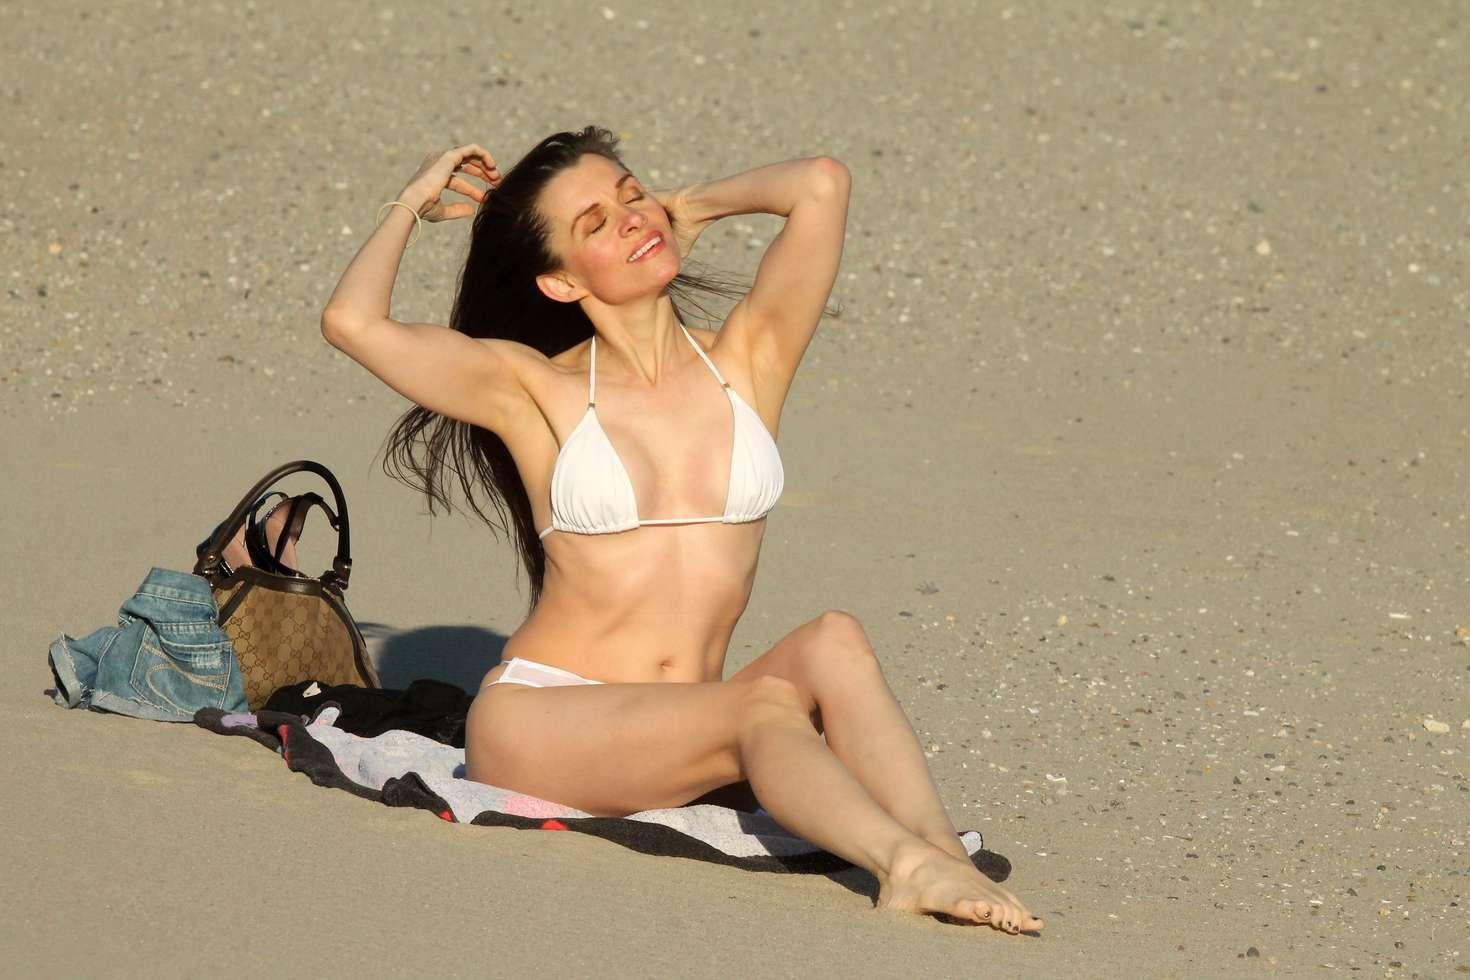 Alicia Arden Bikini naked 172